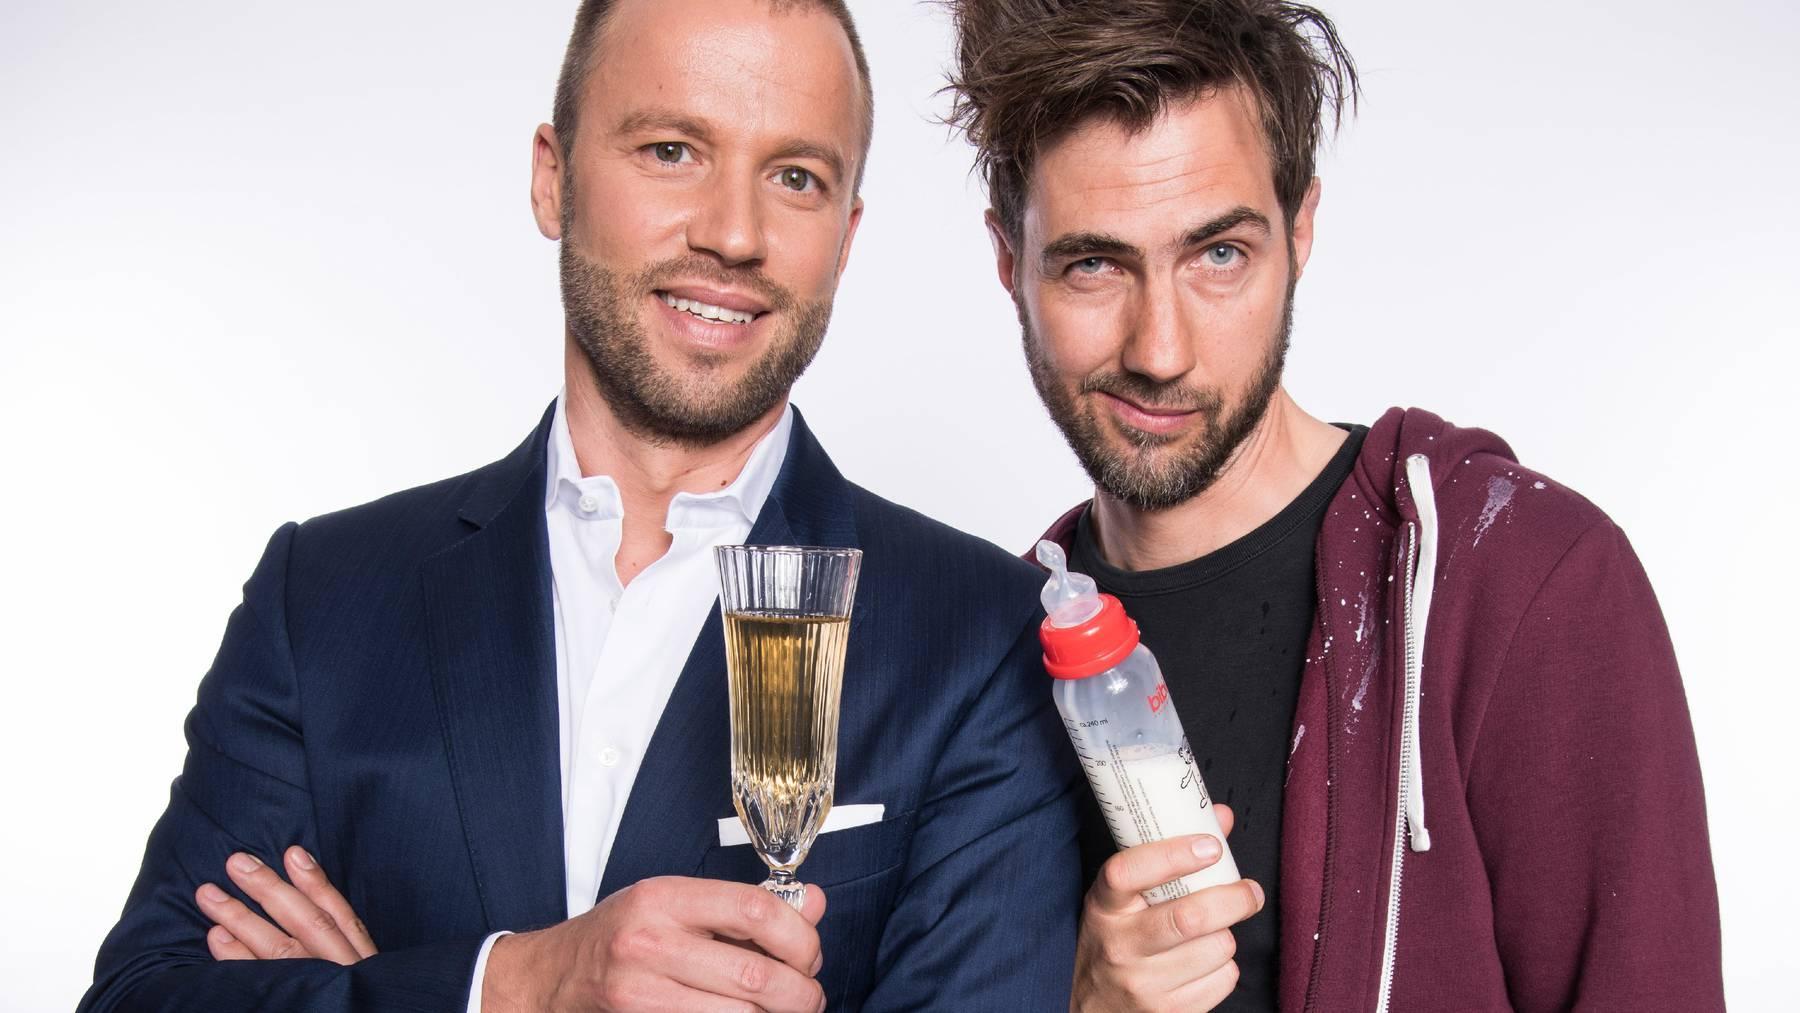 Jonny Fischer und Manuel Burkart bilden das Cabaret Divertimento.